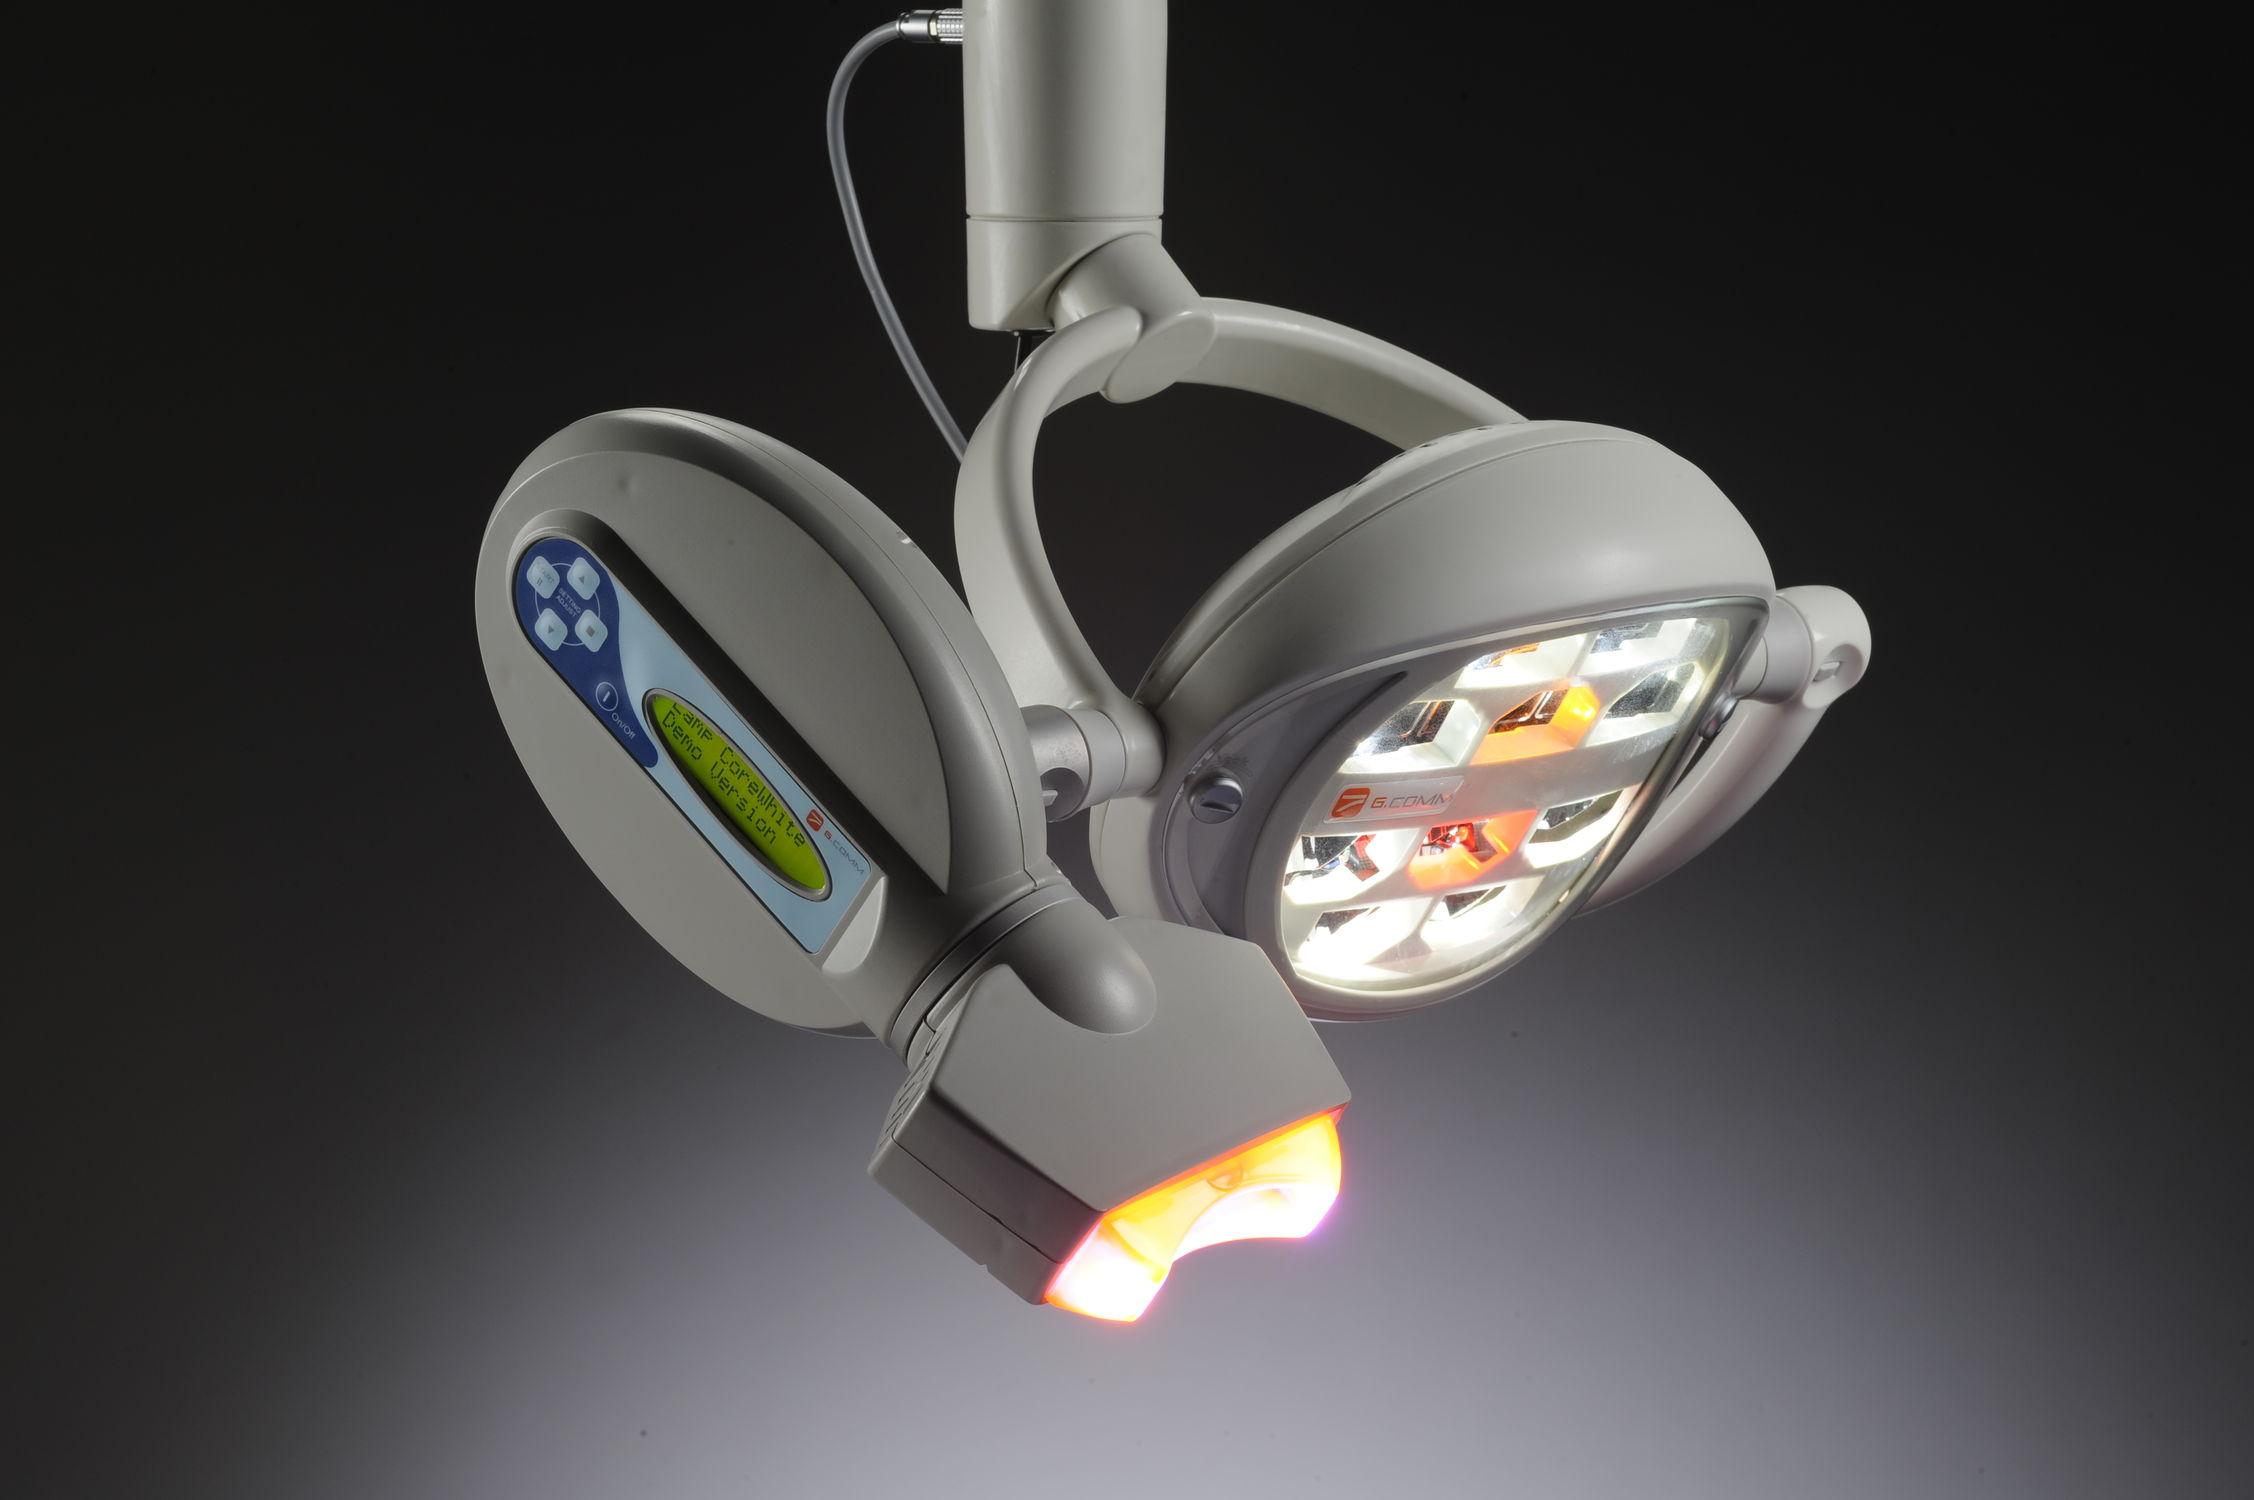 Lampada scialitica odontoiatrica a led polaris g.comm s.r.l. video